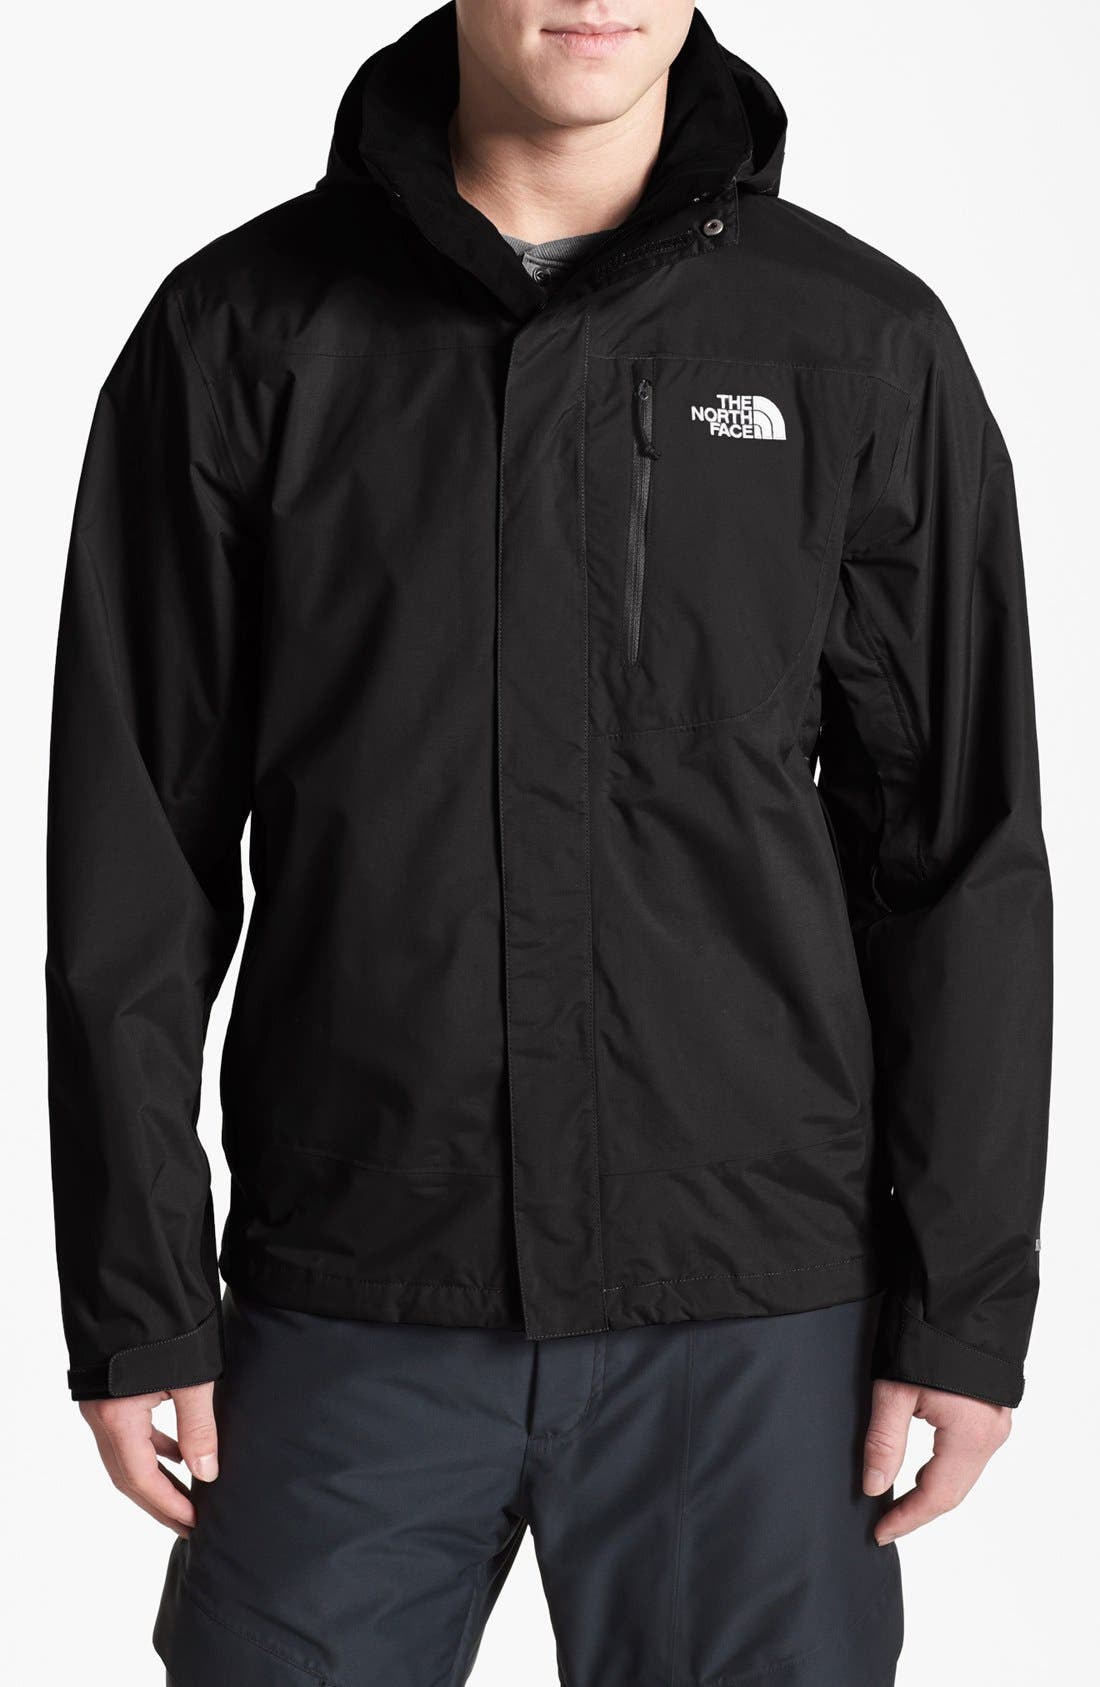 Alternate Image 1 Selected - The North Face 'Varius Guide' Seam Sealed Waterproof Jacket